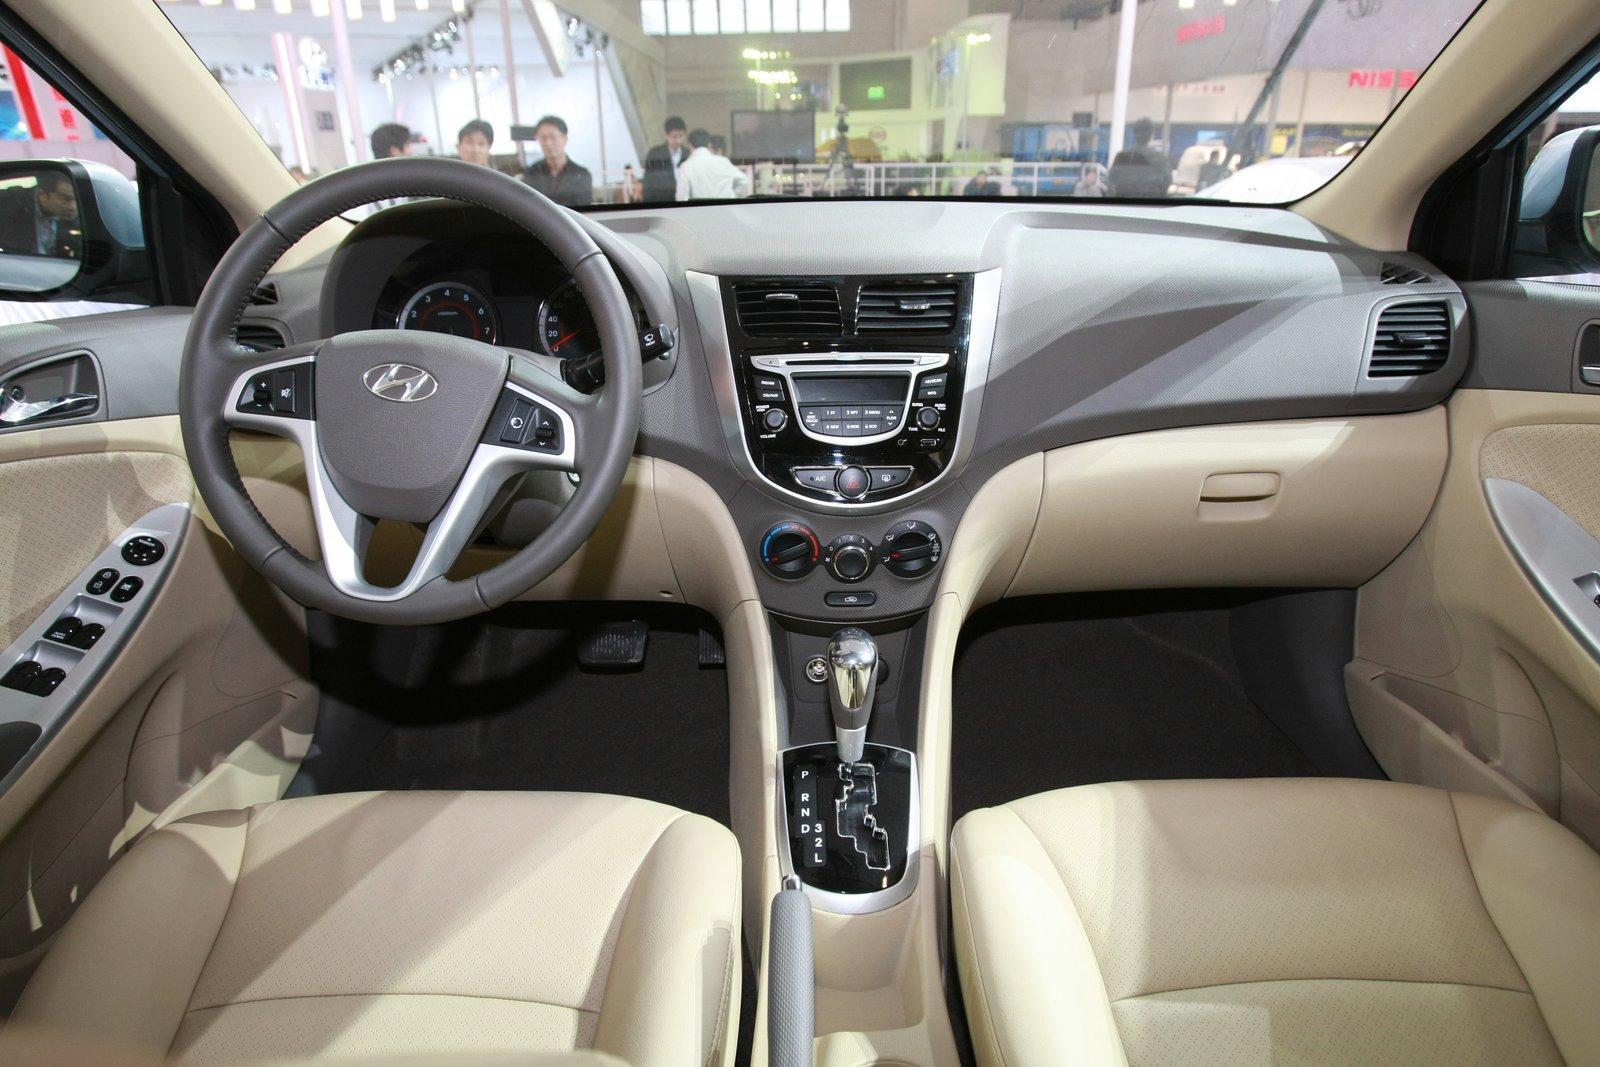 http://3.bp.blogspot.com/_J3_liDBfbvs/S-LLYXqFKbI/AAAAAAAAqK8/_Wng17EcQg4/s1600/2011-Hyundai-Verna-Accent-Interior.jpg